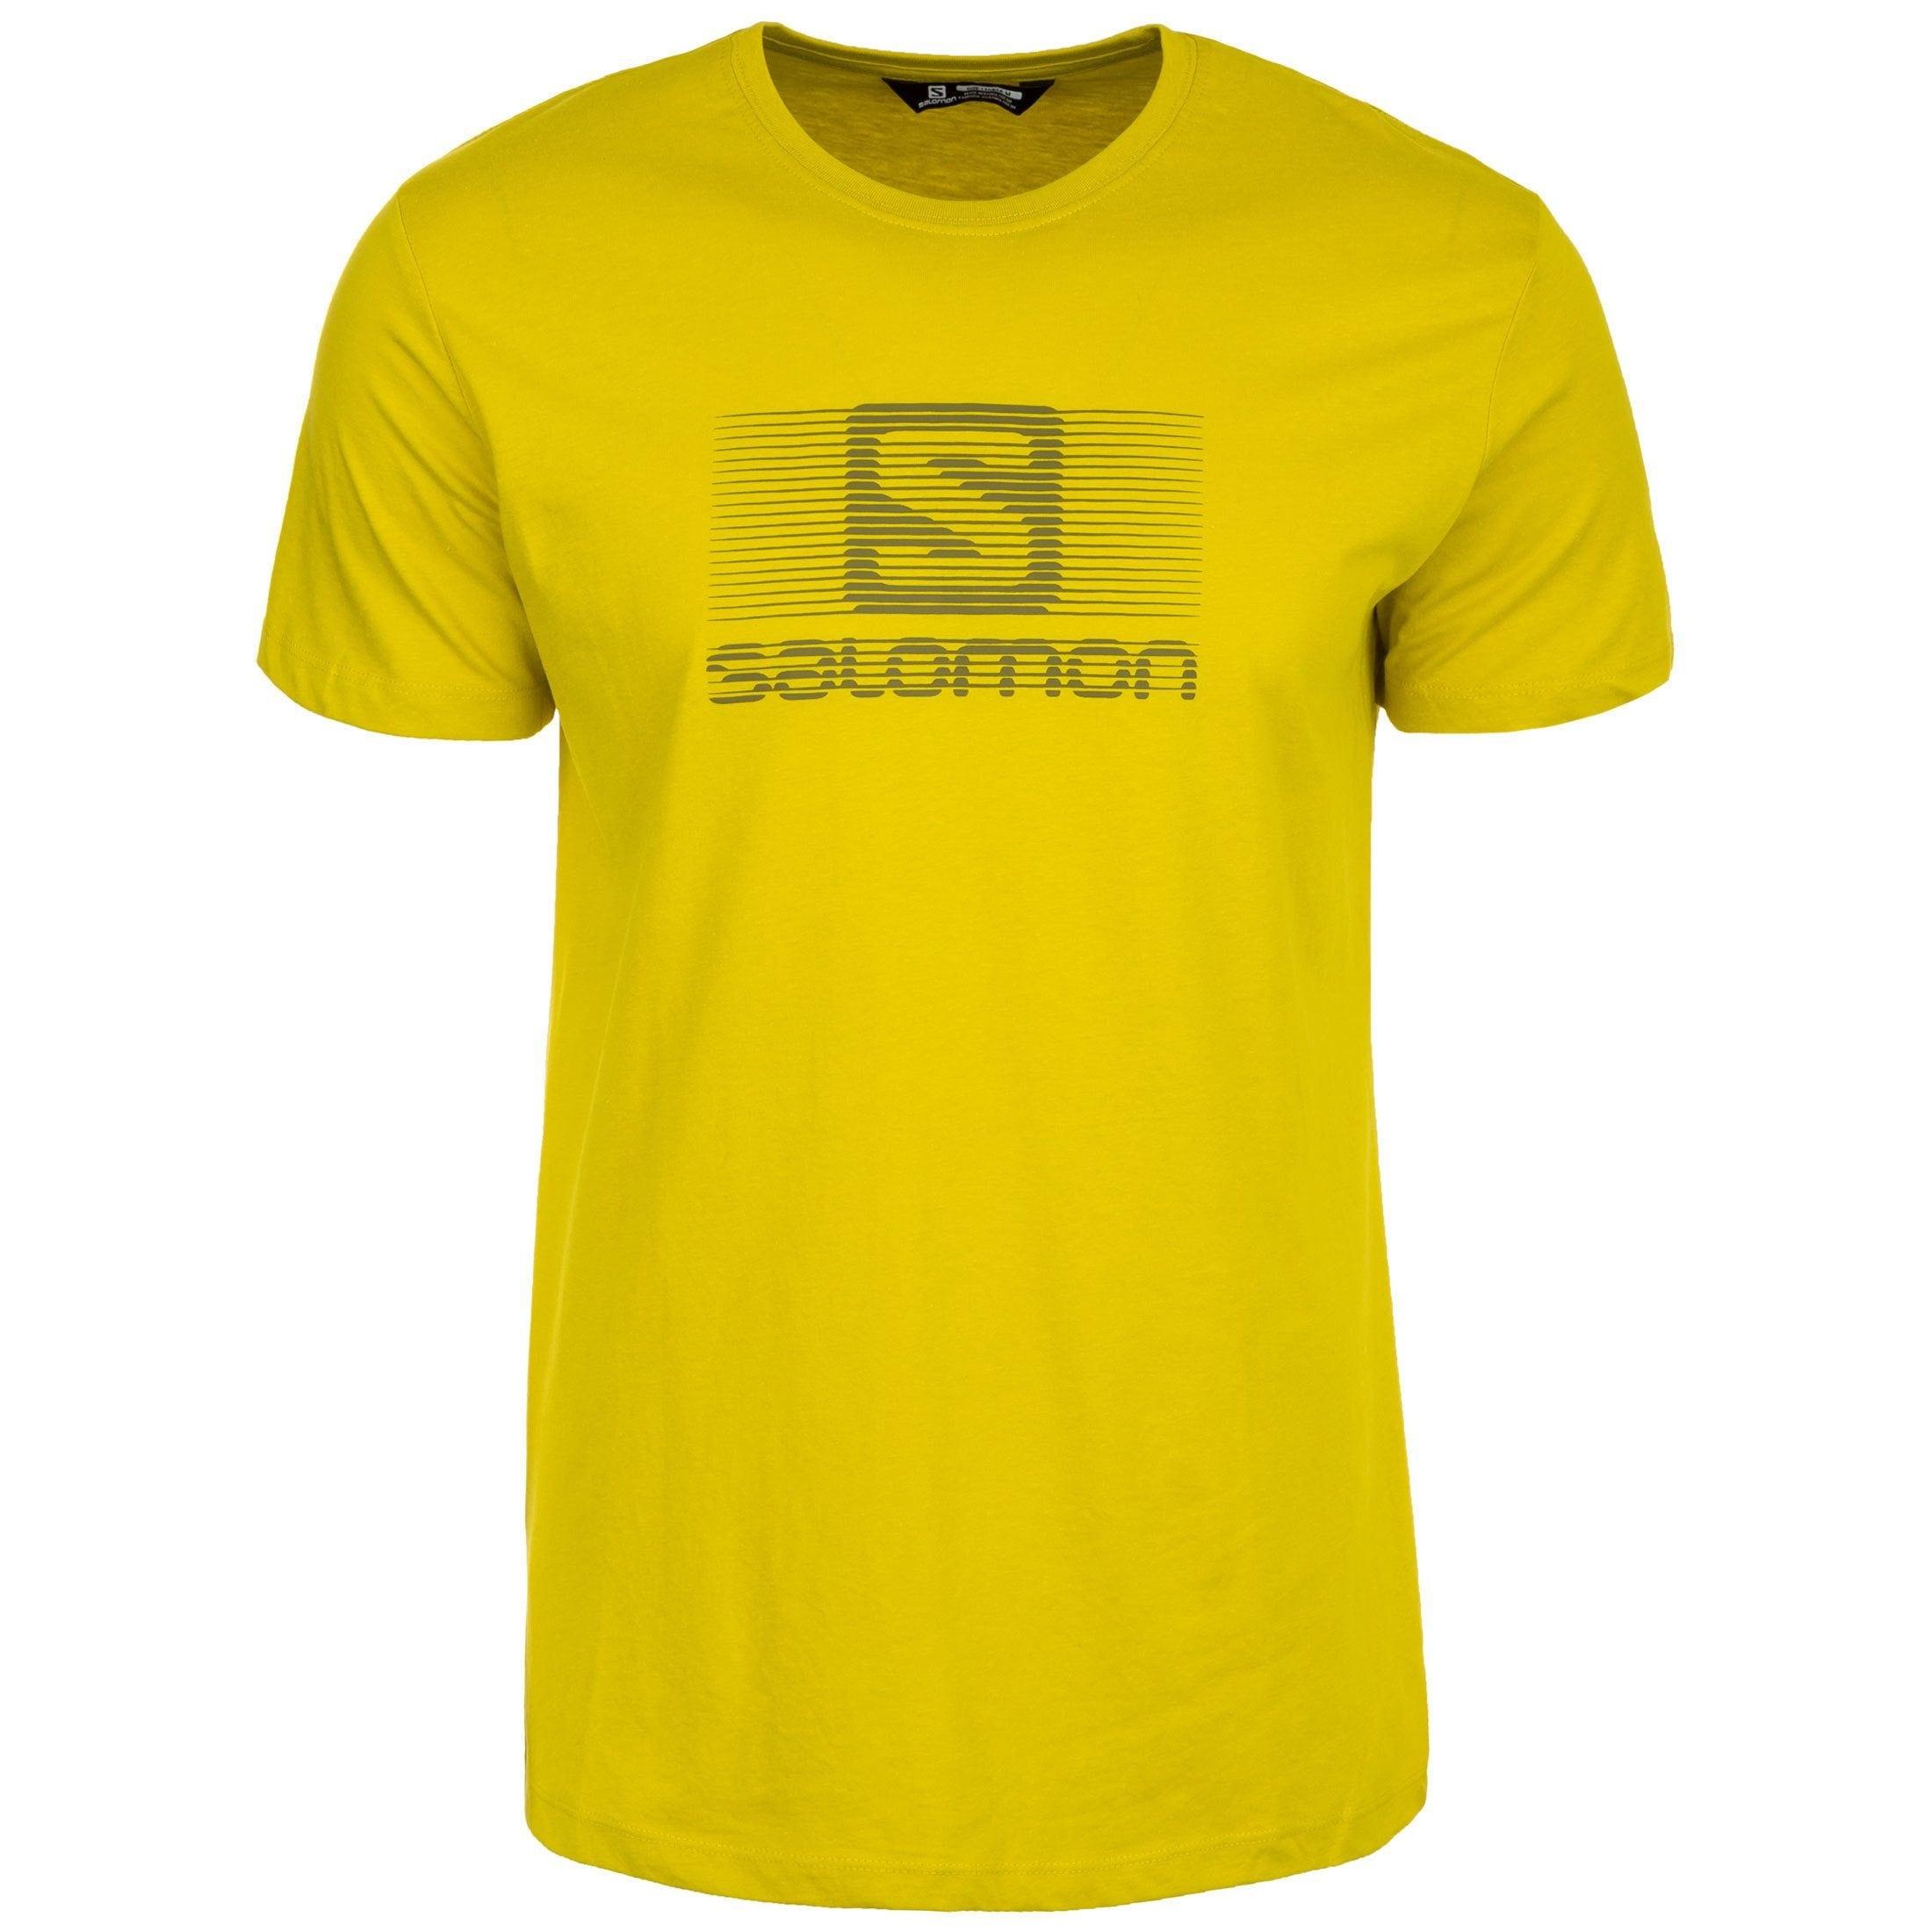 Salomon Laufshirt Blend Logo   Sportbekleidung > Sportshirts > Laufshirts   Salomon